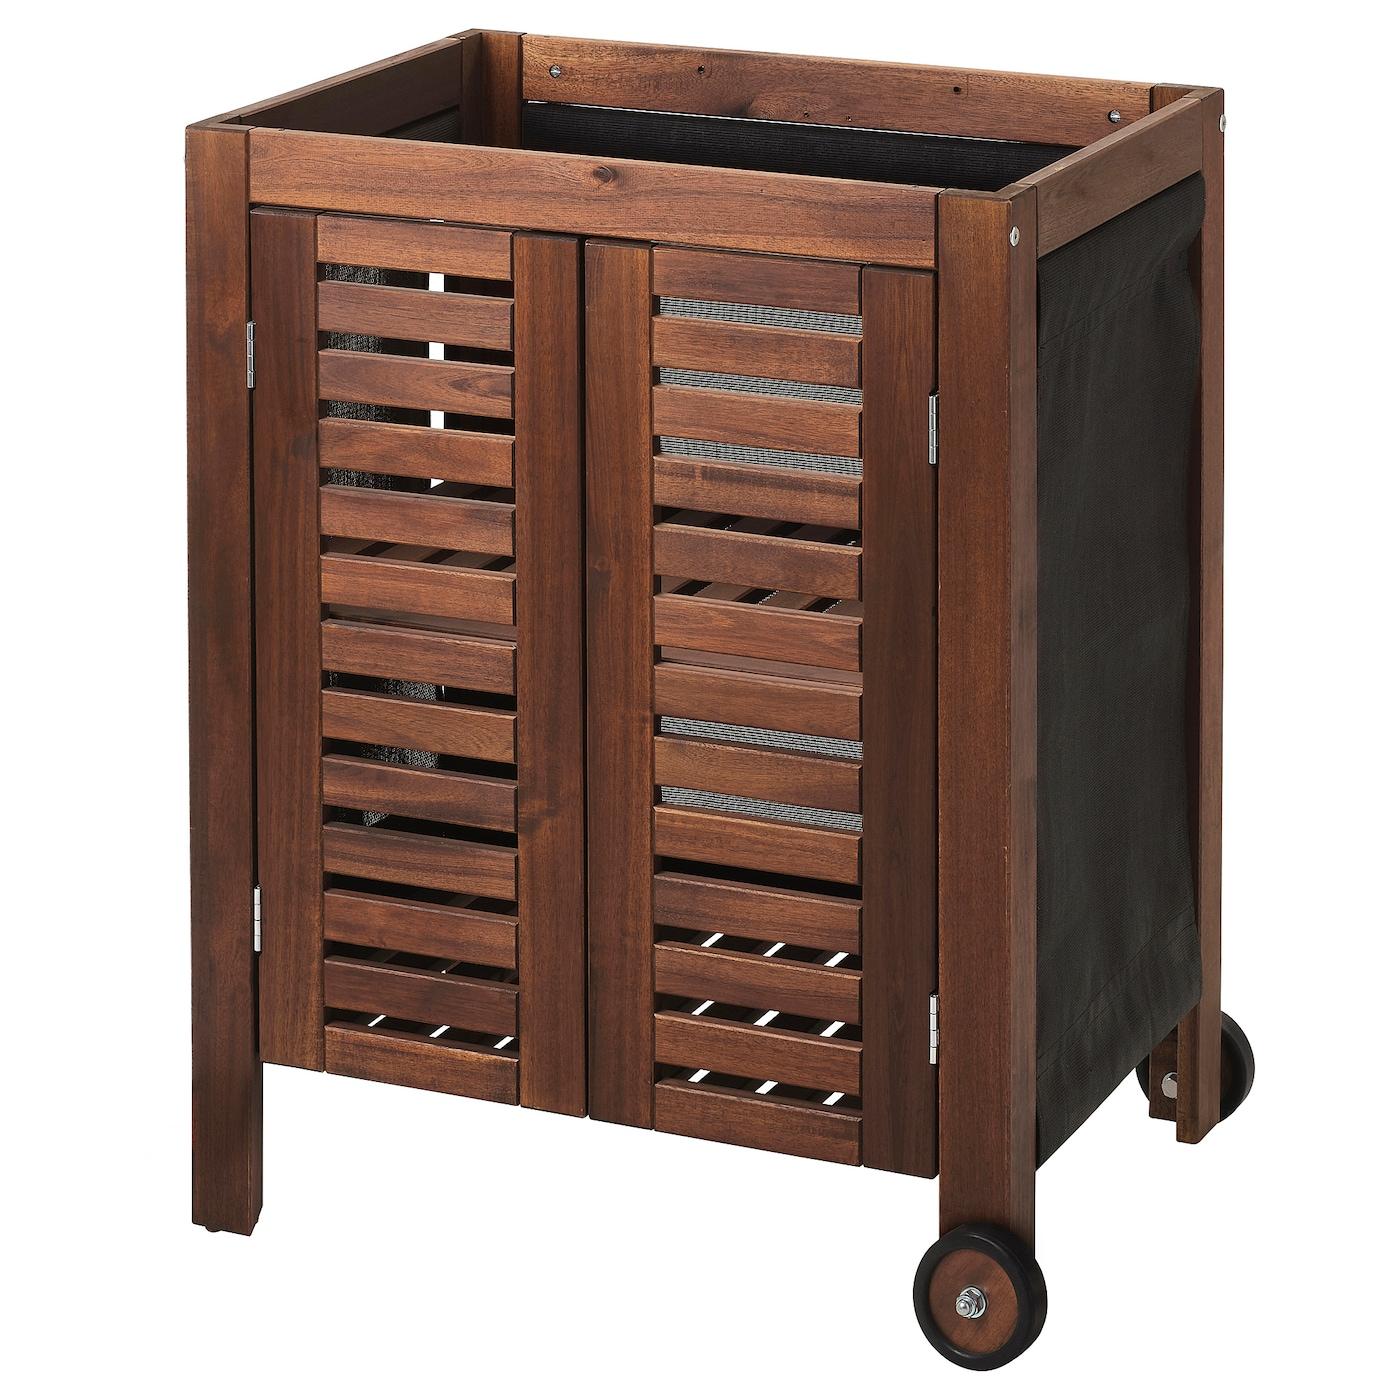 ÄpplarÖ Storage Cabinet Outdoor